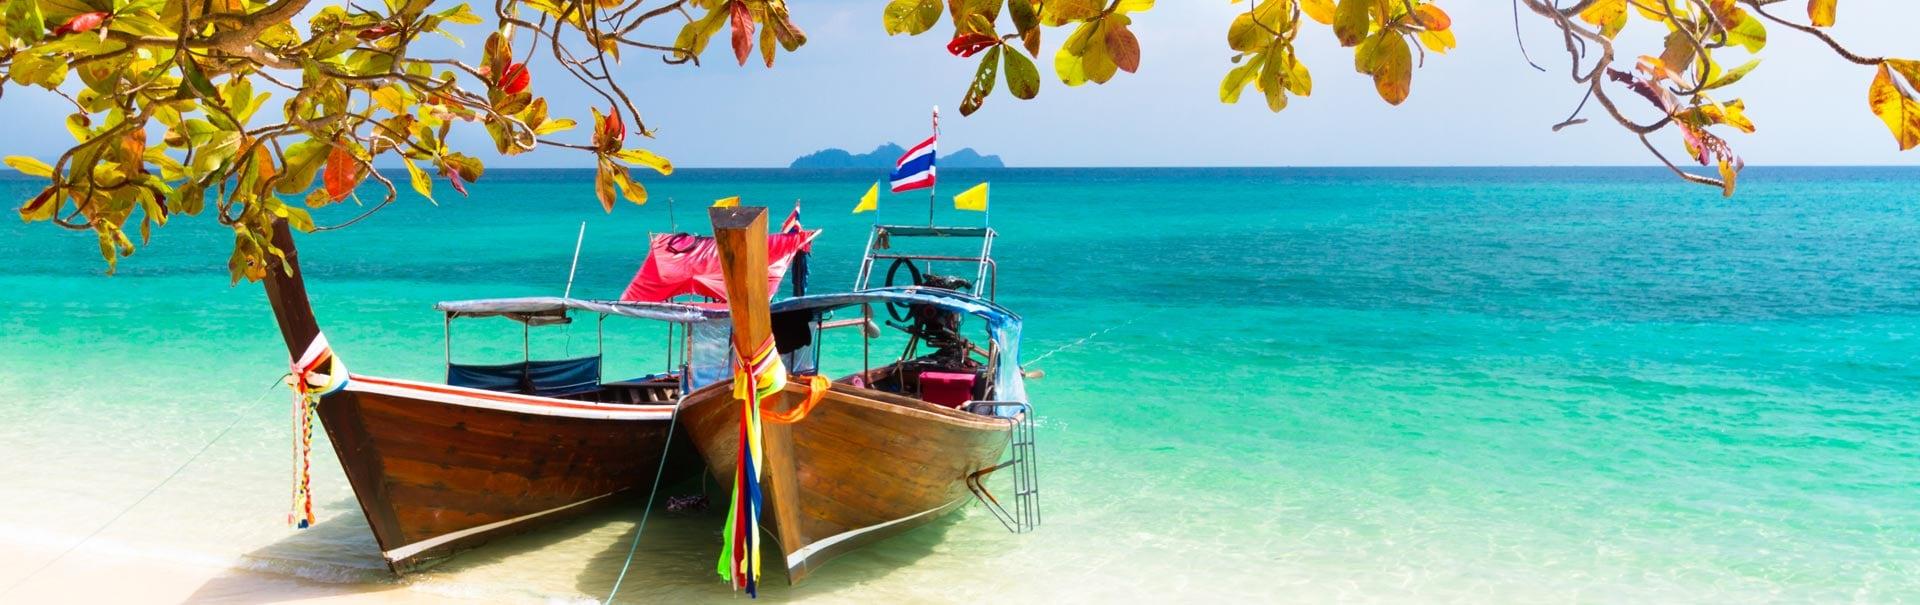 Phuket - Phi Phi and Four Island (SHTH15) Banner